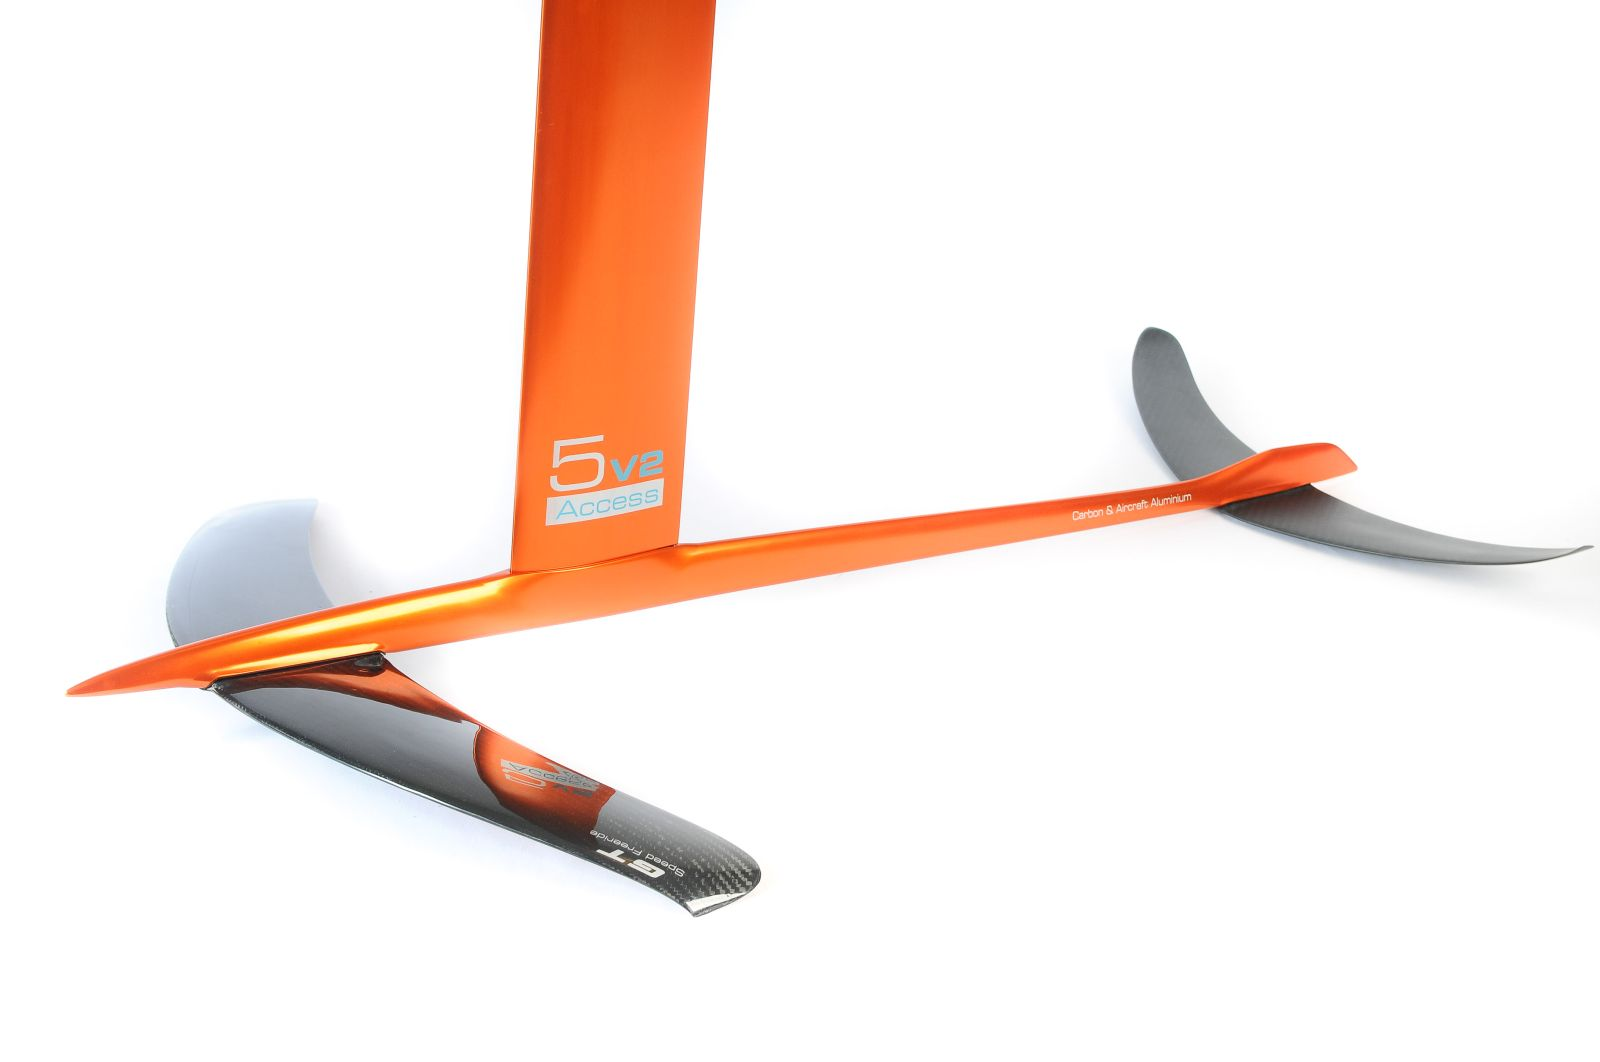 Kitefoil carbon aluminium alpinefoil 5 0 access v2 2488 1